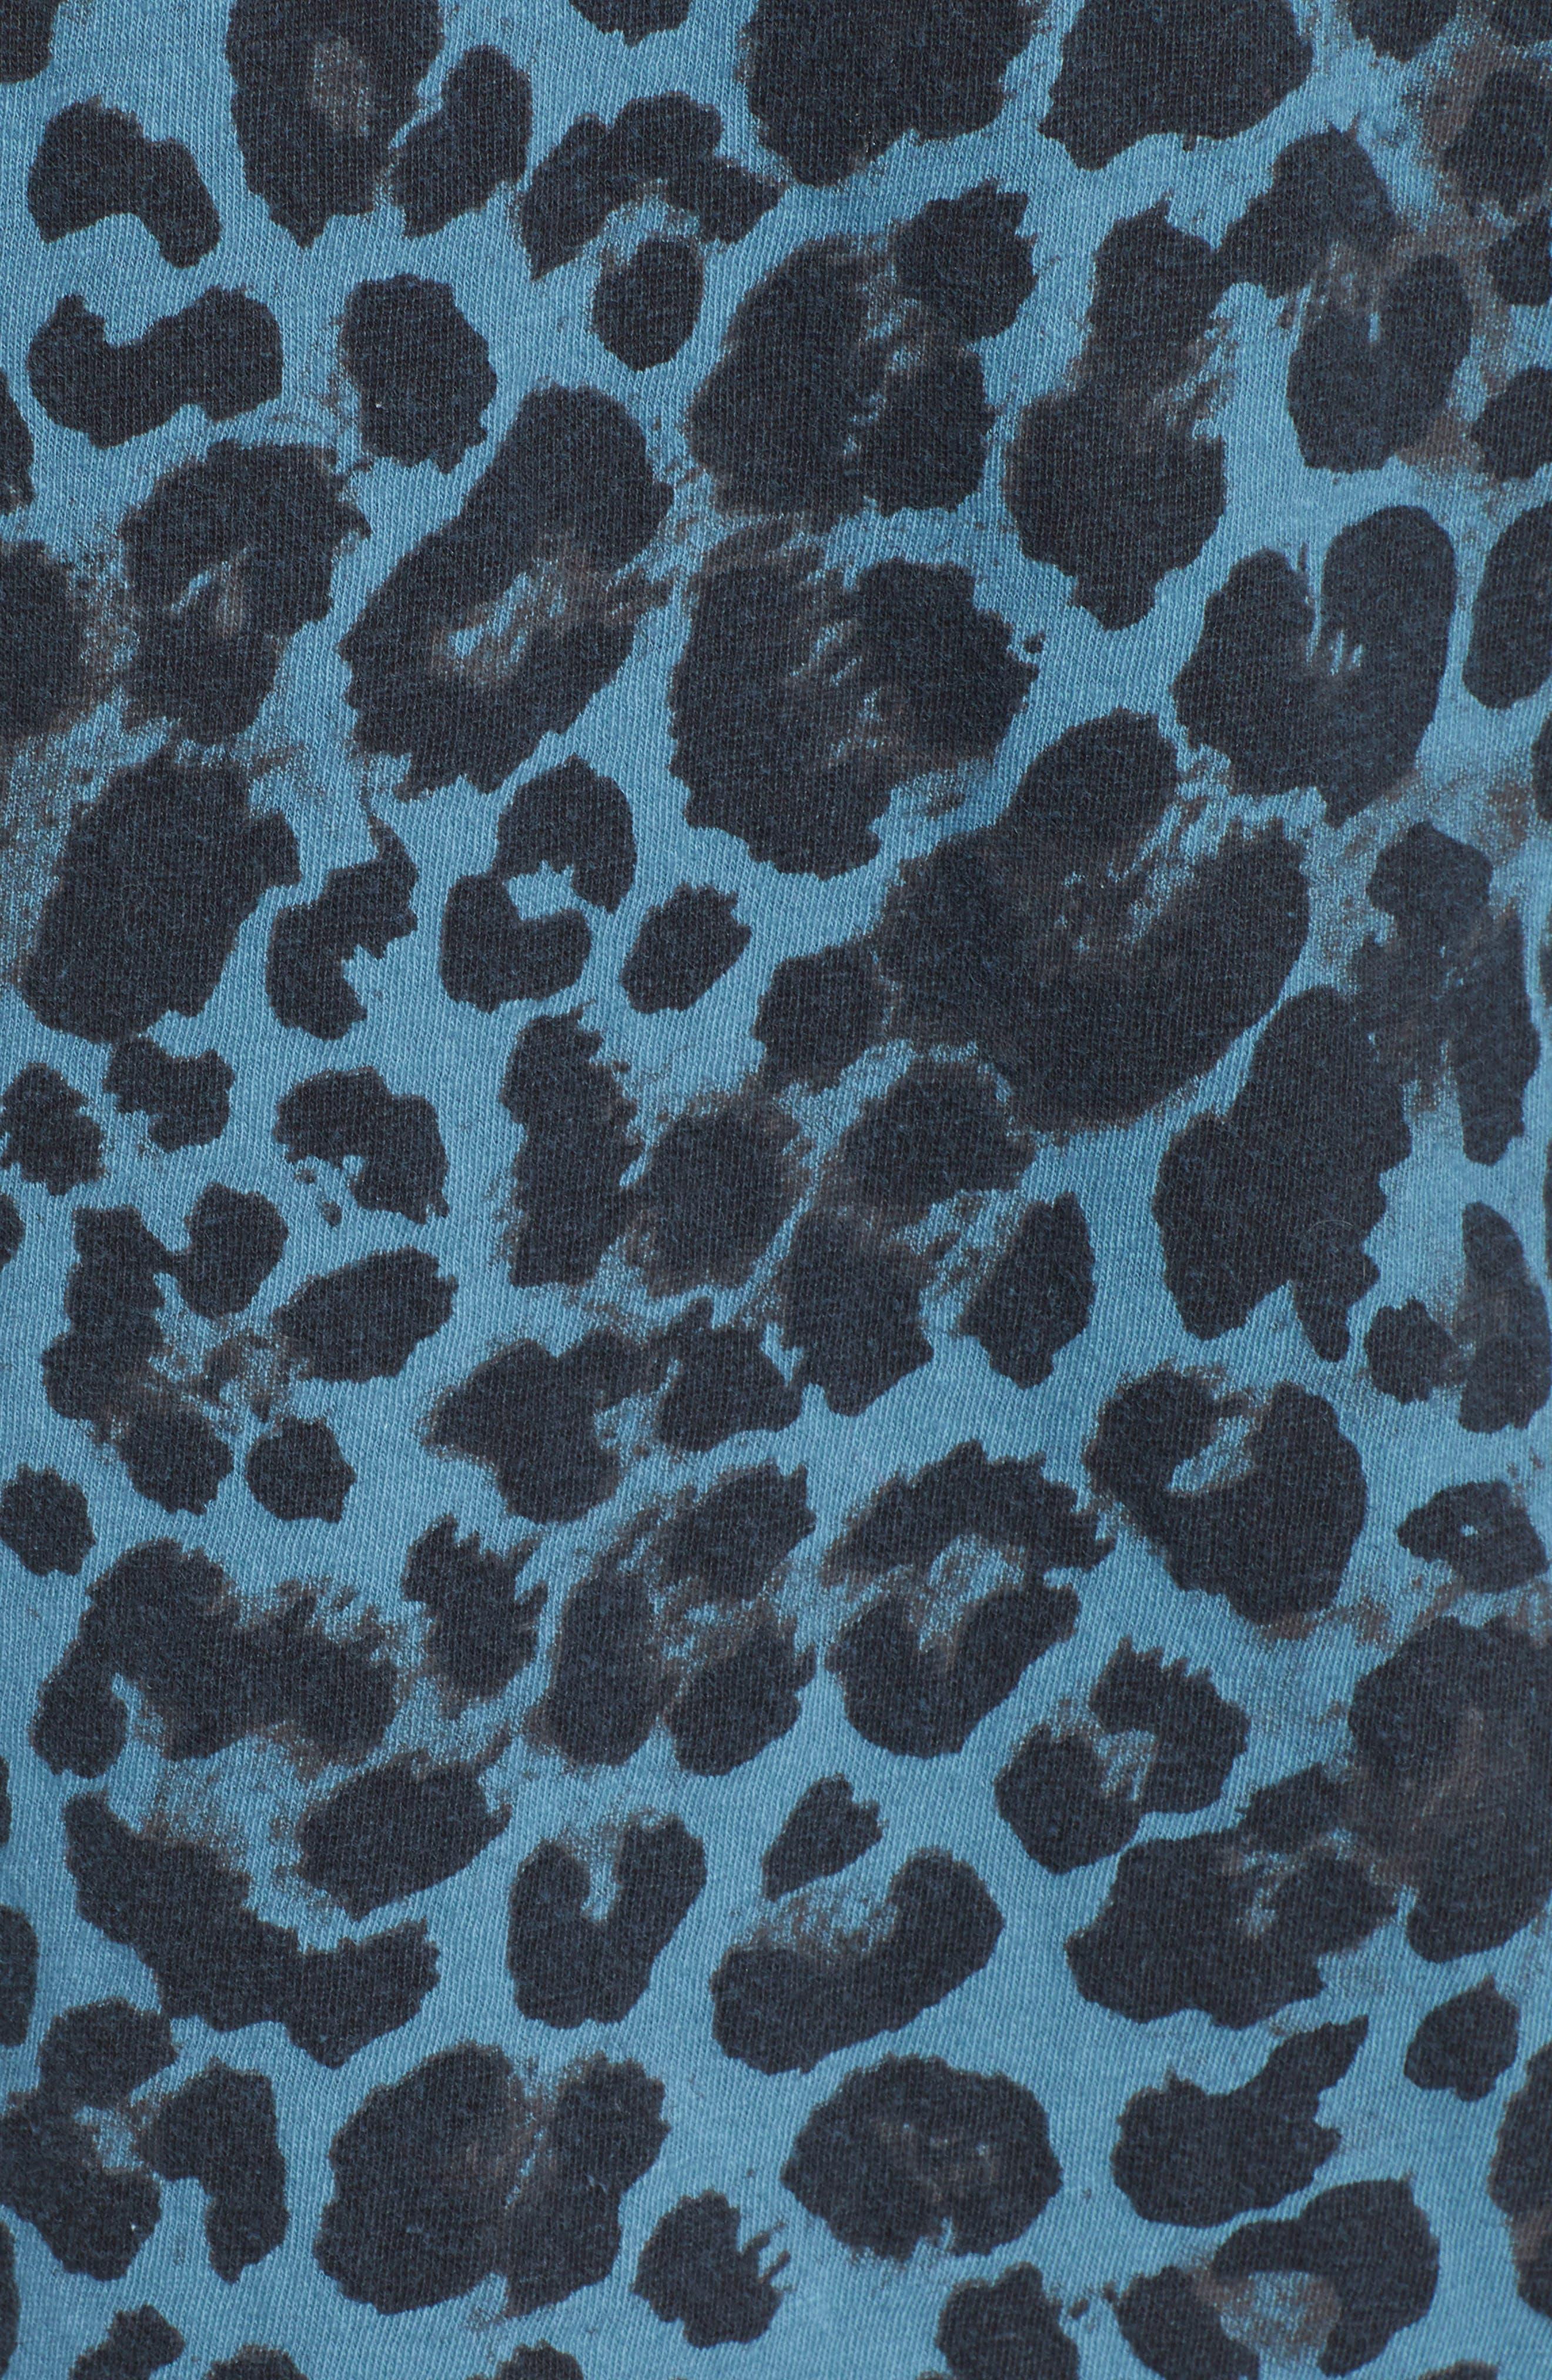 Leopard Print Cutout Tee,                             Alternate thumbnail 5, color,                             BLUE LEOPARD PRINT